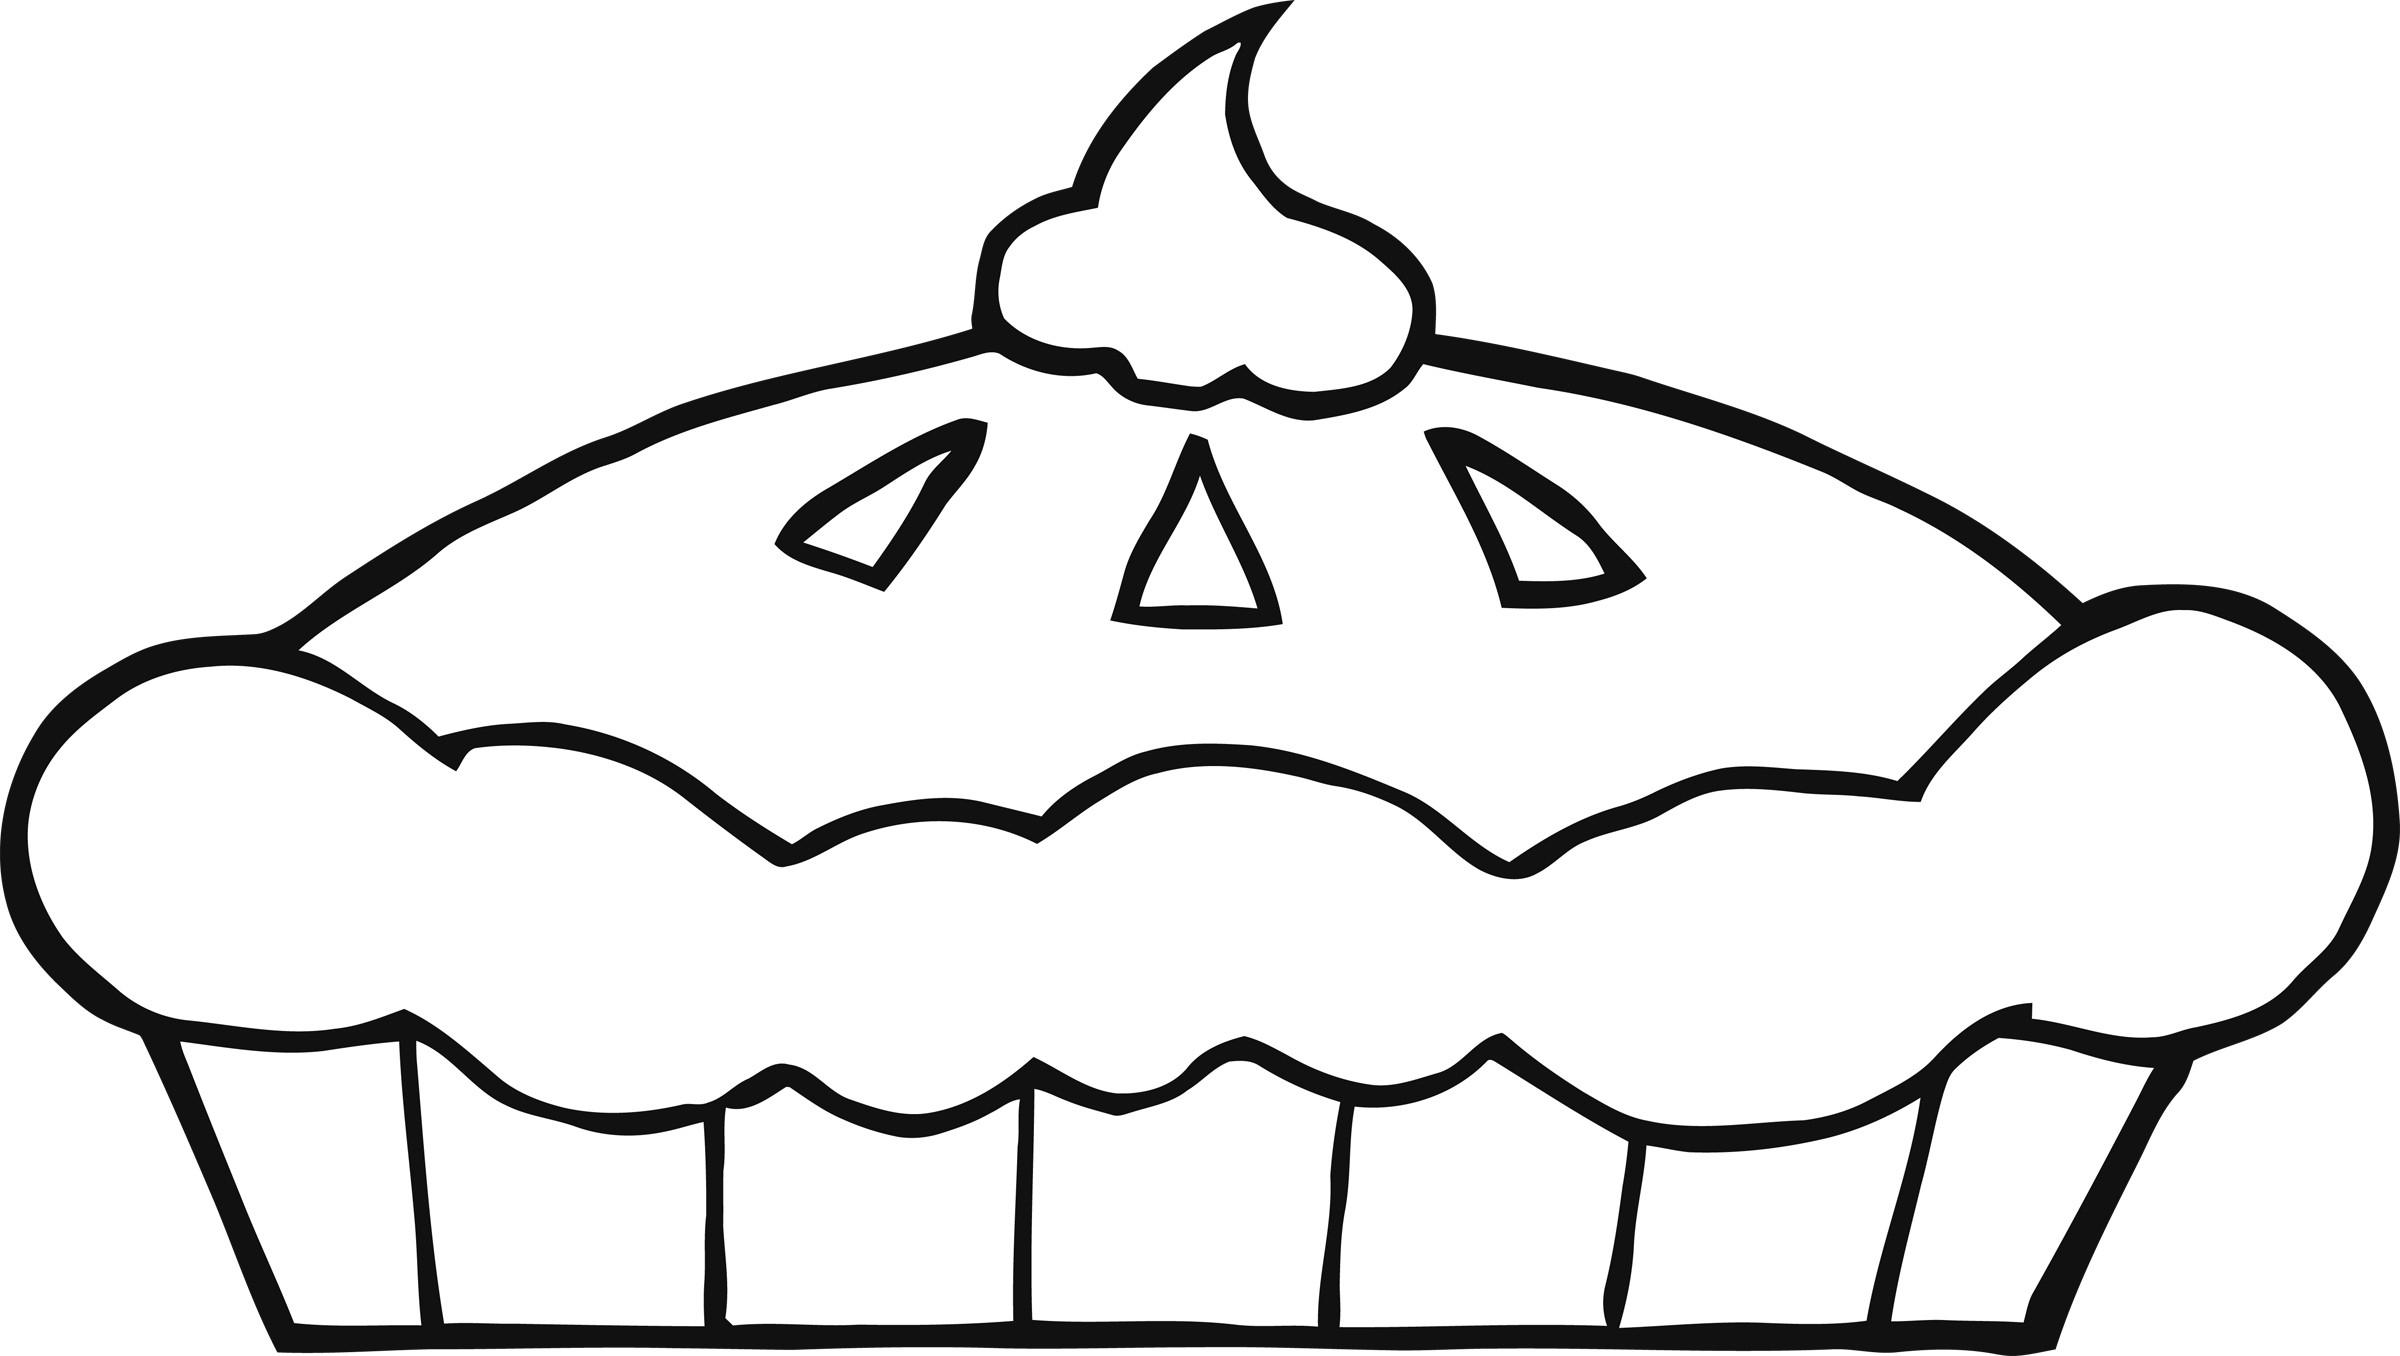 2400x1356 Pie Black And White Pie Clip Art Black And White Free Clipart